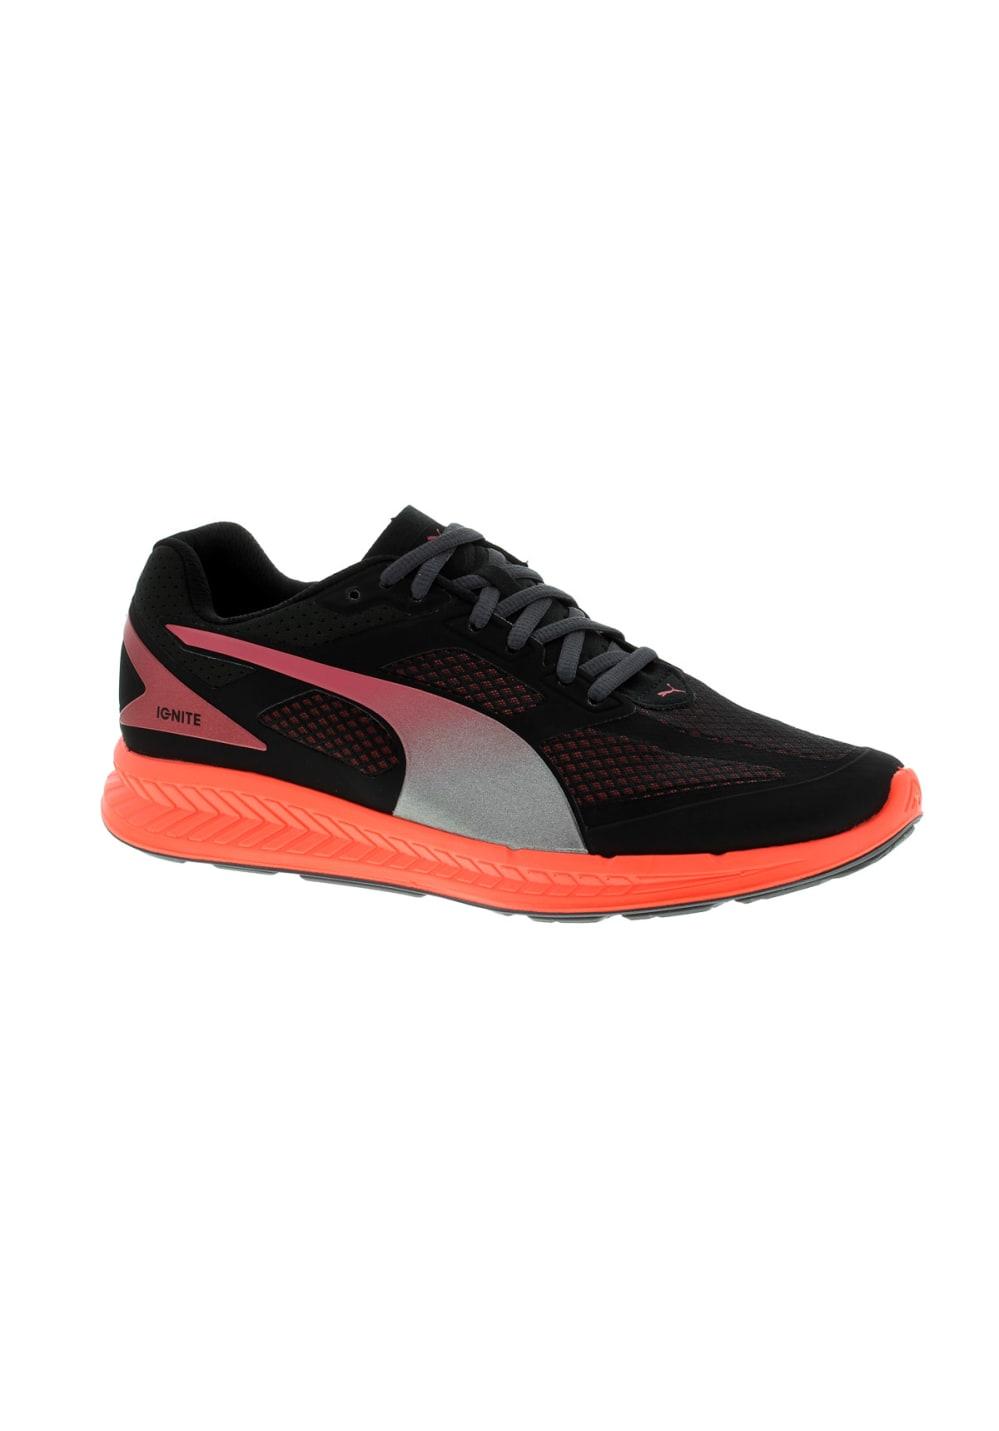 Noir Running Pour Chaussures Puma Mesh Ignite Femme SUpjLVzGqM